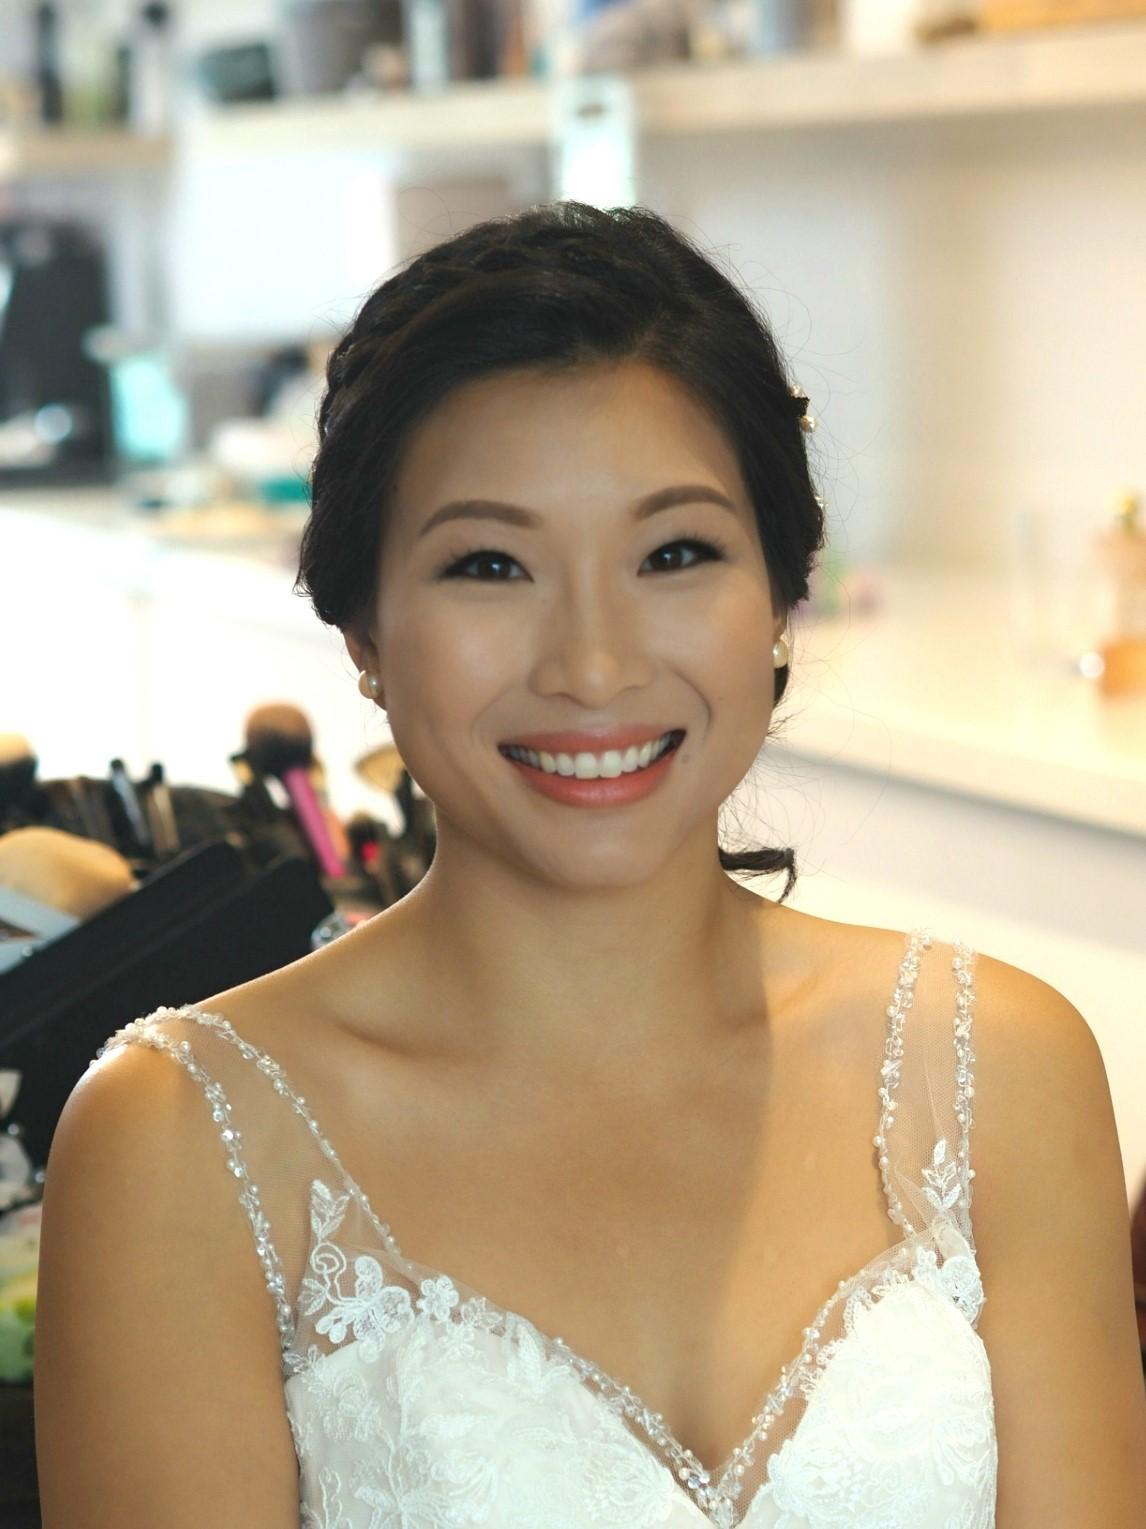 Toronto bride wedding makeup onsite on location